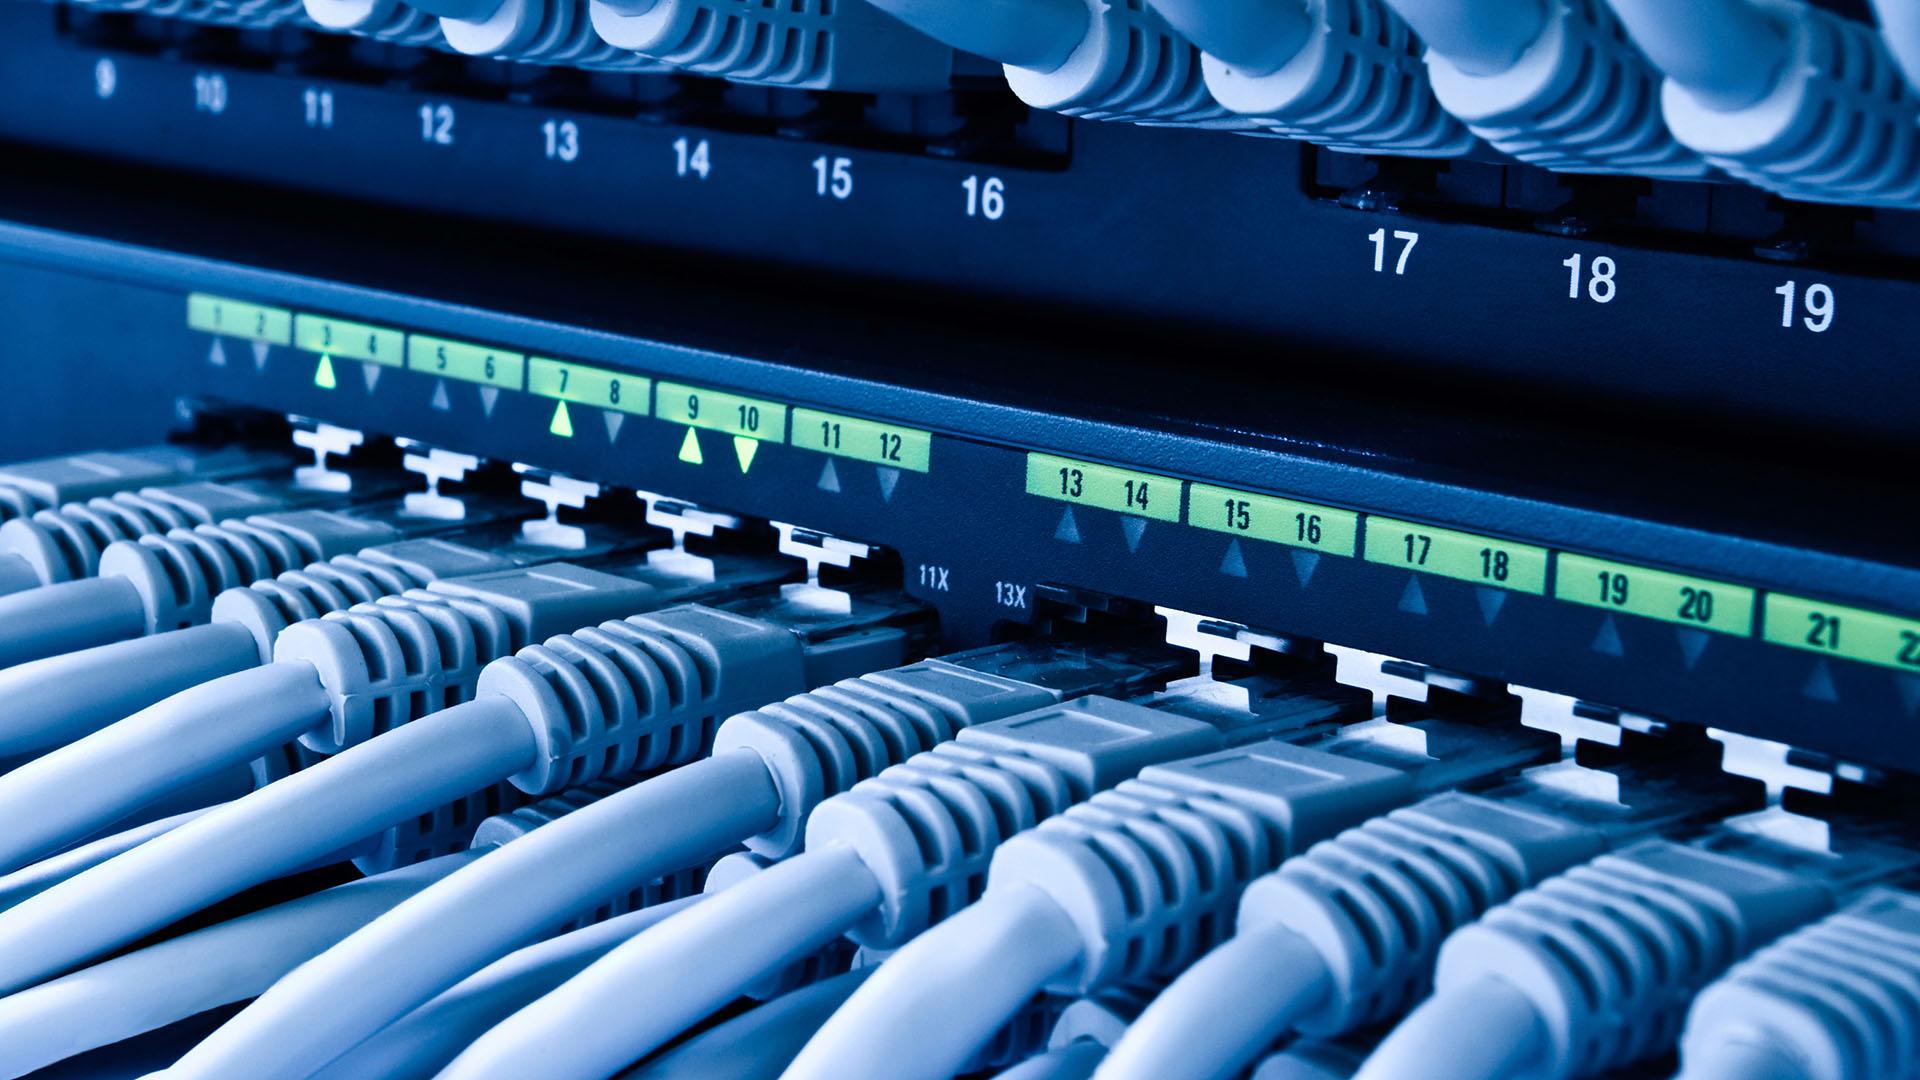 Beaver Dam Kentucky Superior Voice & Data Network Cabling Contractor